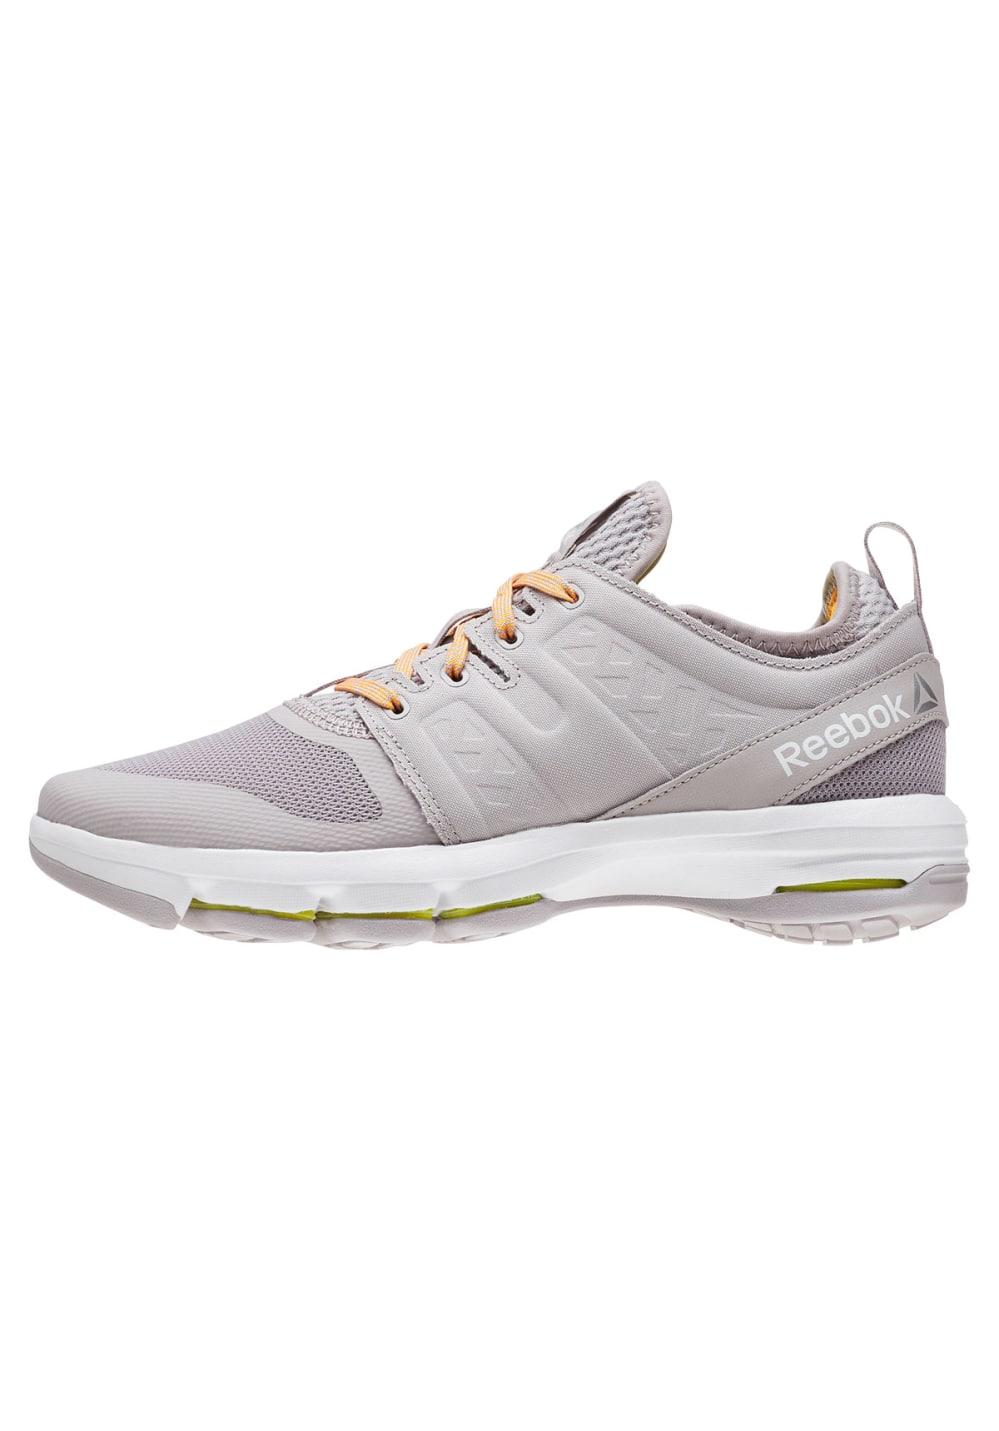 d1903e8e9a7f ... Reebok Cloudride DMX - Fitness shoes for Women - Grey. Back to  Overview. 1  2  3. Previous. Next